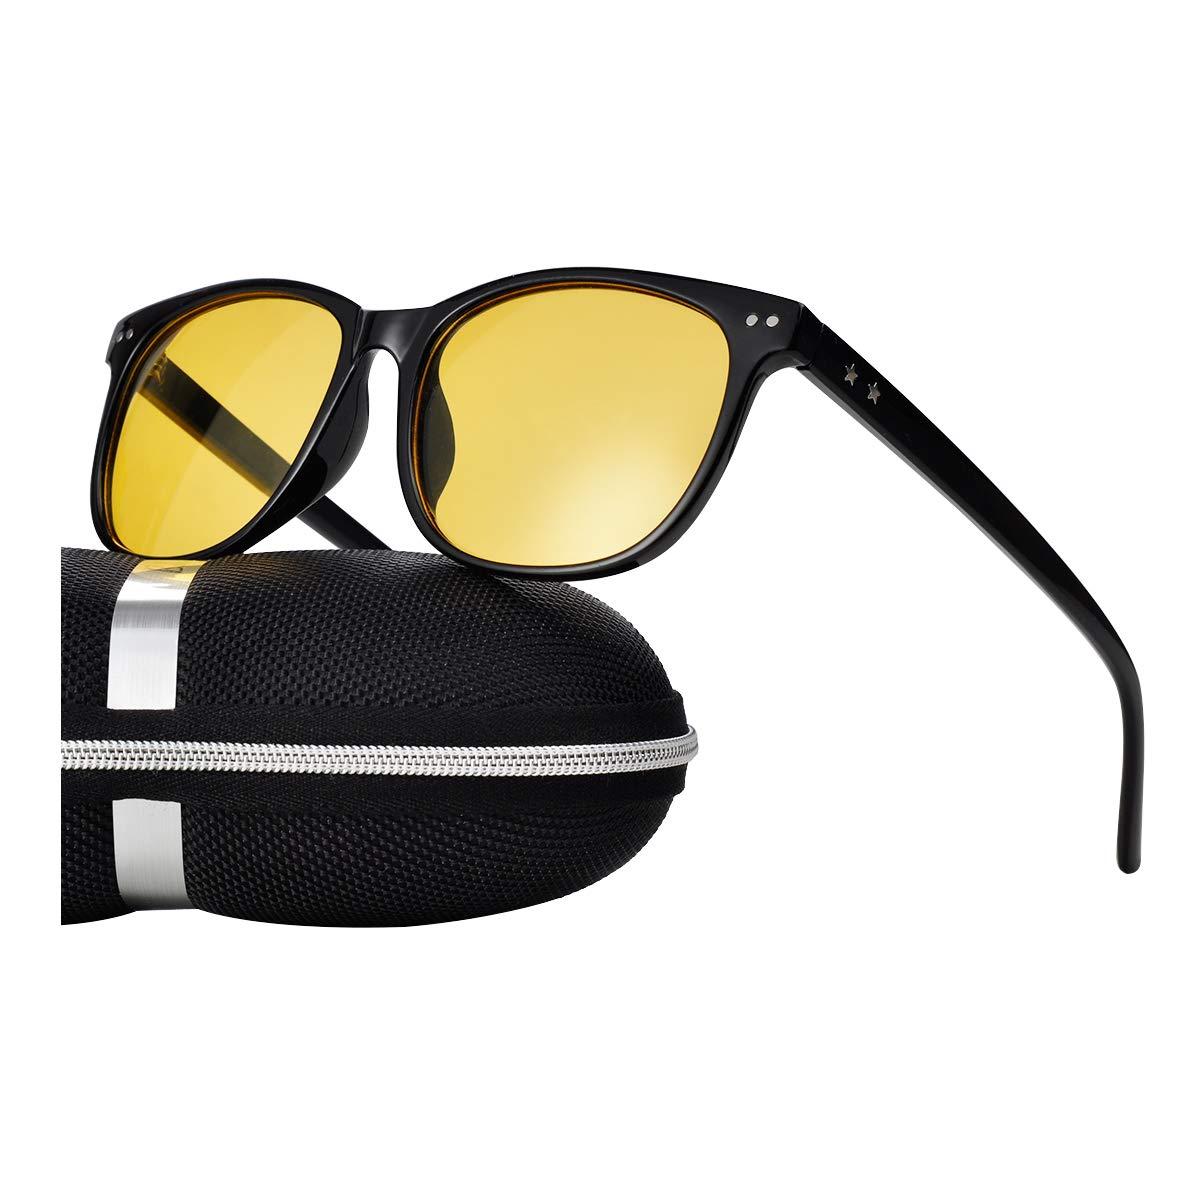 Night Vision Driving Glasses Polarized Anti-glare Clear Sun Glasses Men & Women Fashion (Black-1, 56)